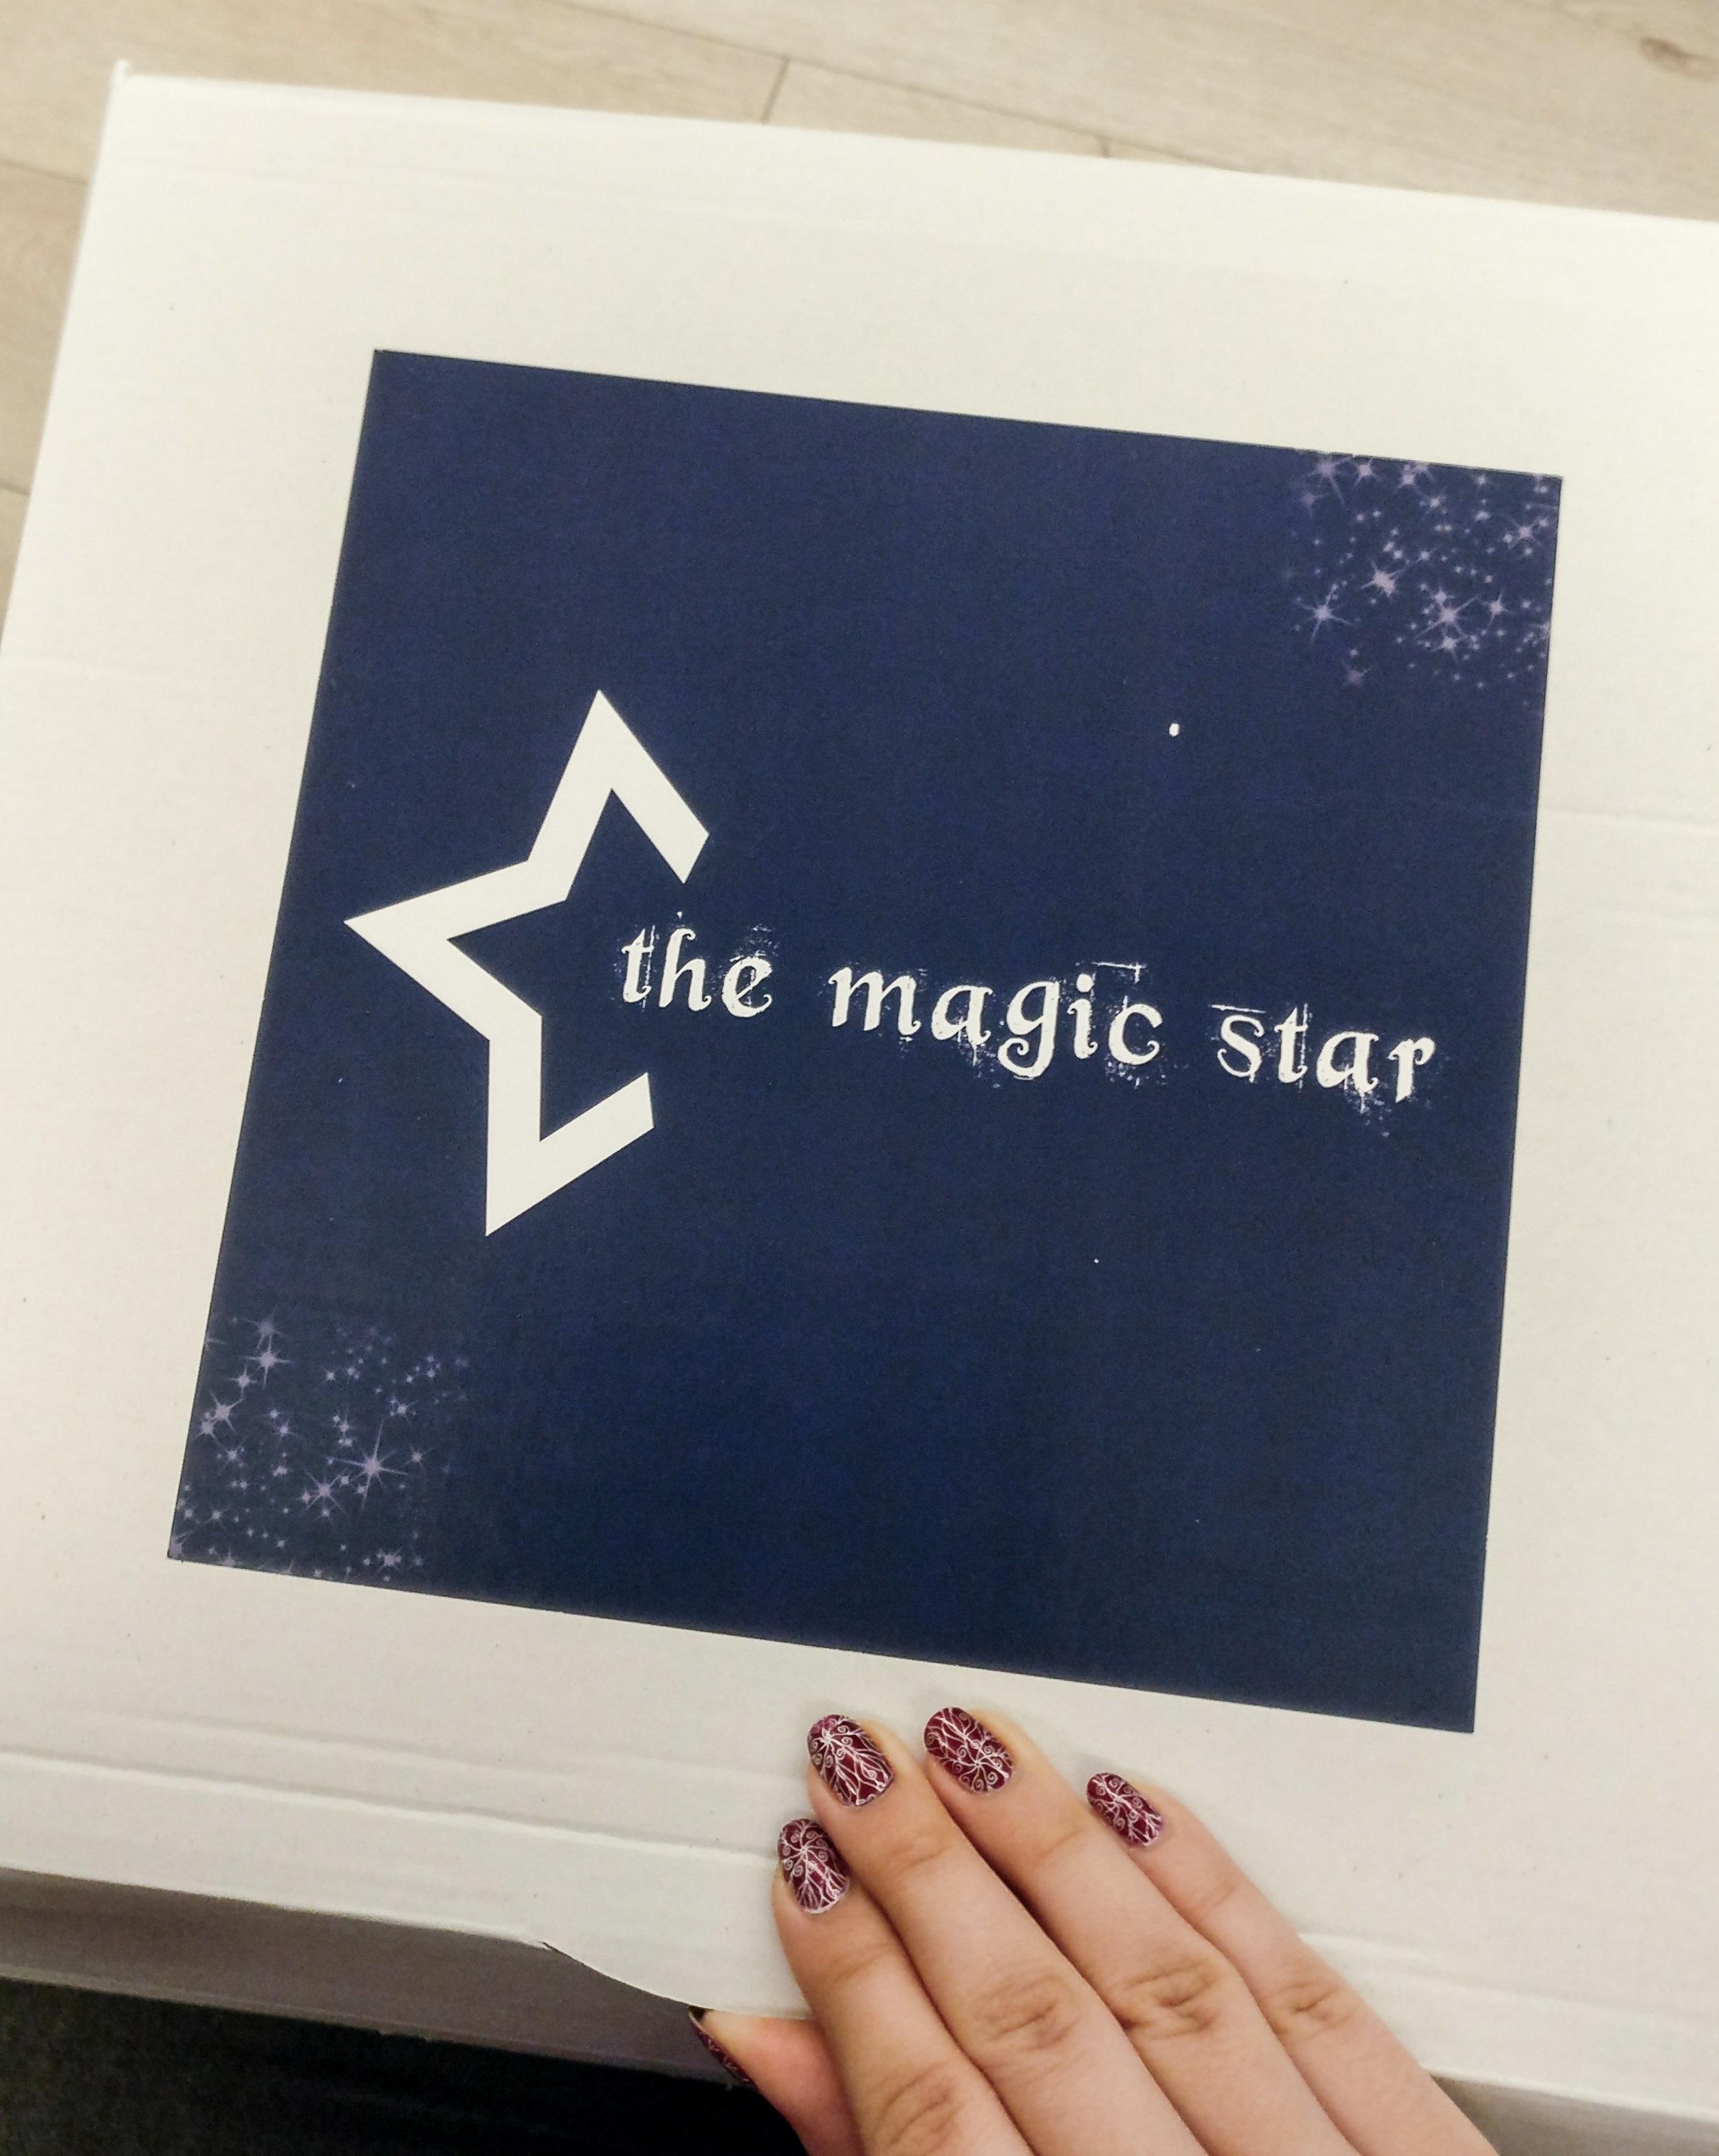 the-magic-star-box.jpg